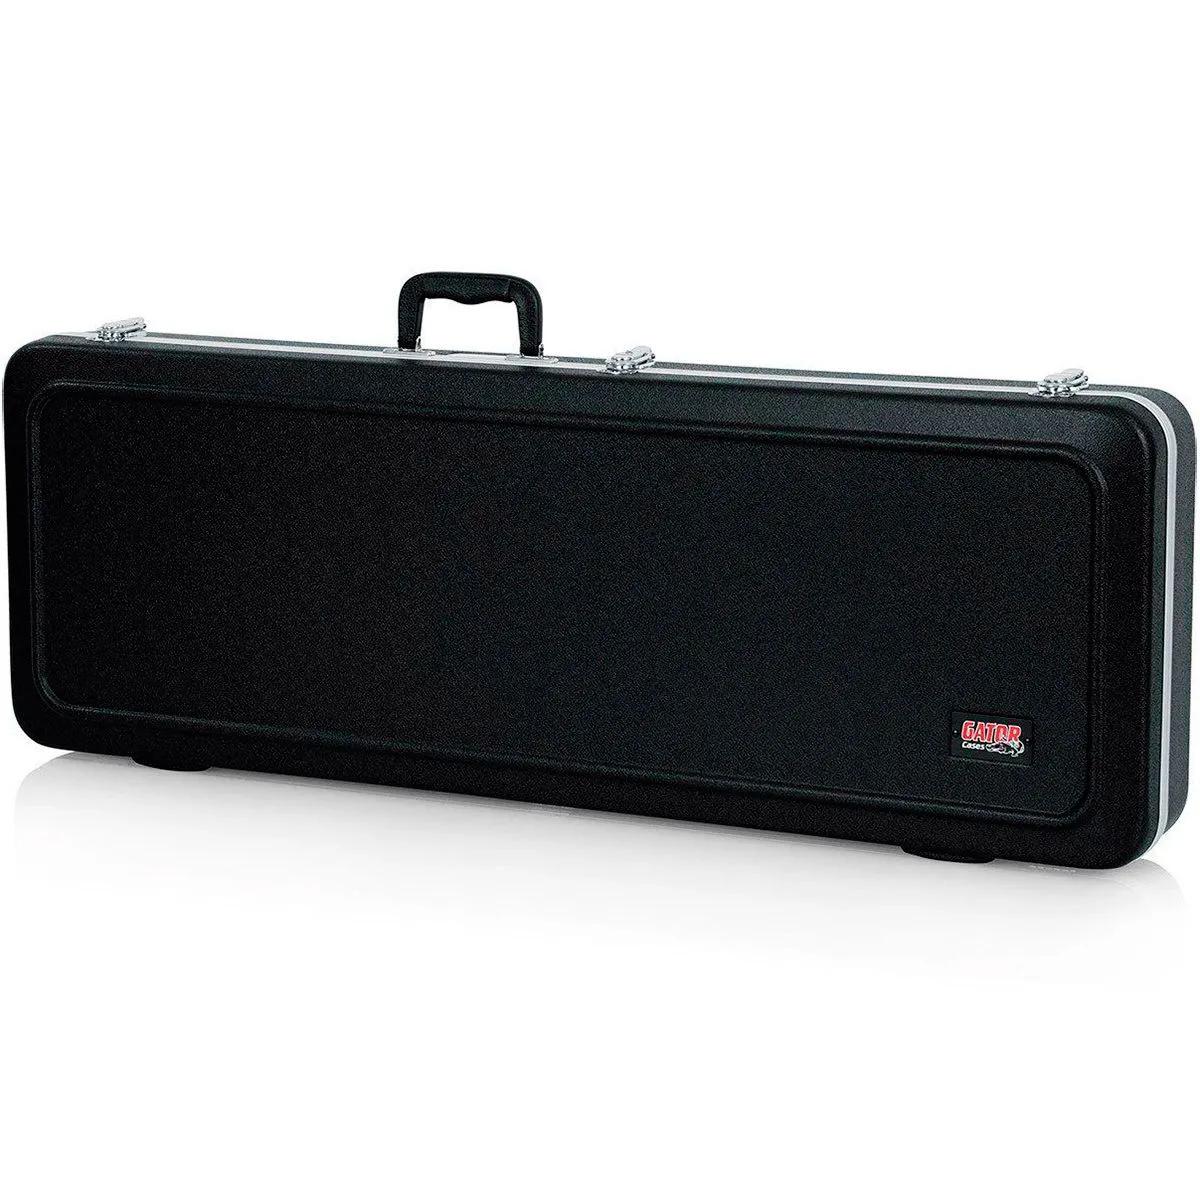 Case Gator GC-ELECTRIC-A para Guitarra em ABS